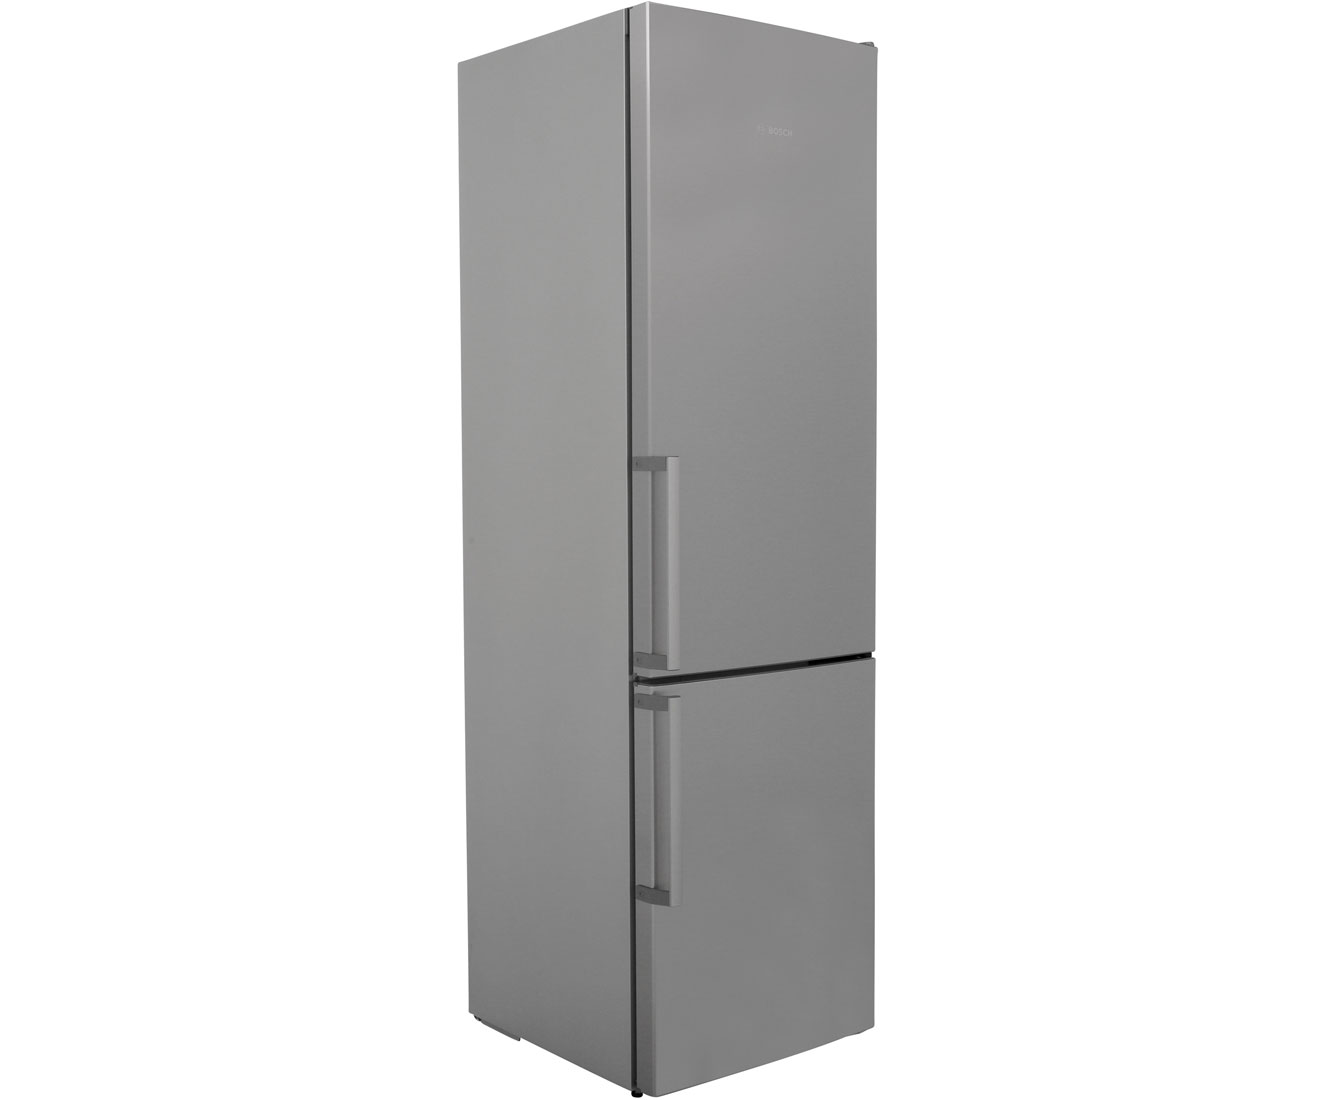 Bosch Kühlschrank Serie 6 : Bosch serie kge ai kühl gefrierkombination er breite